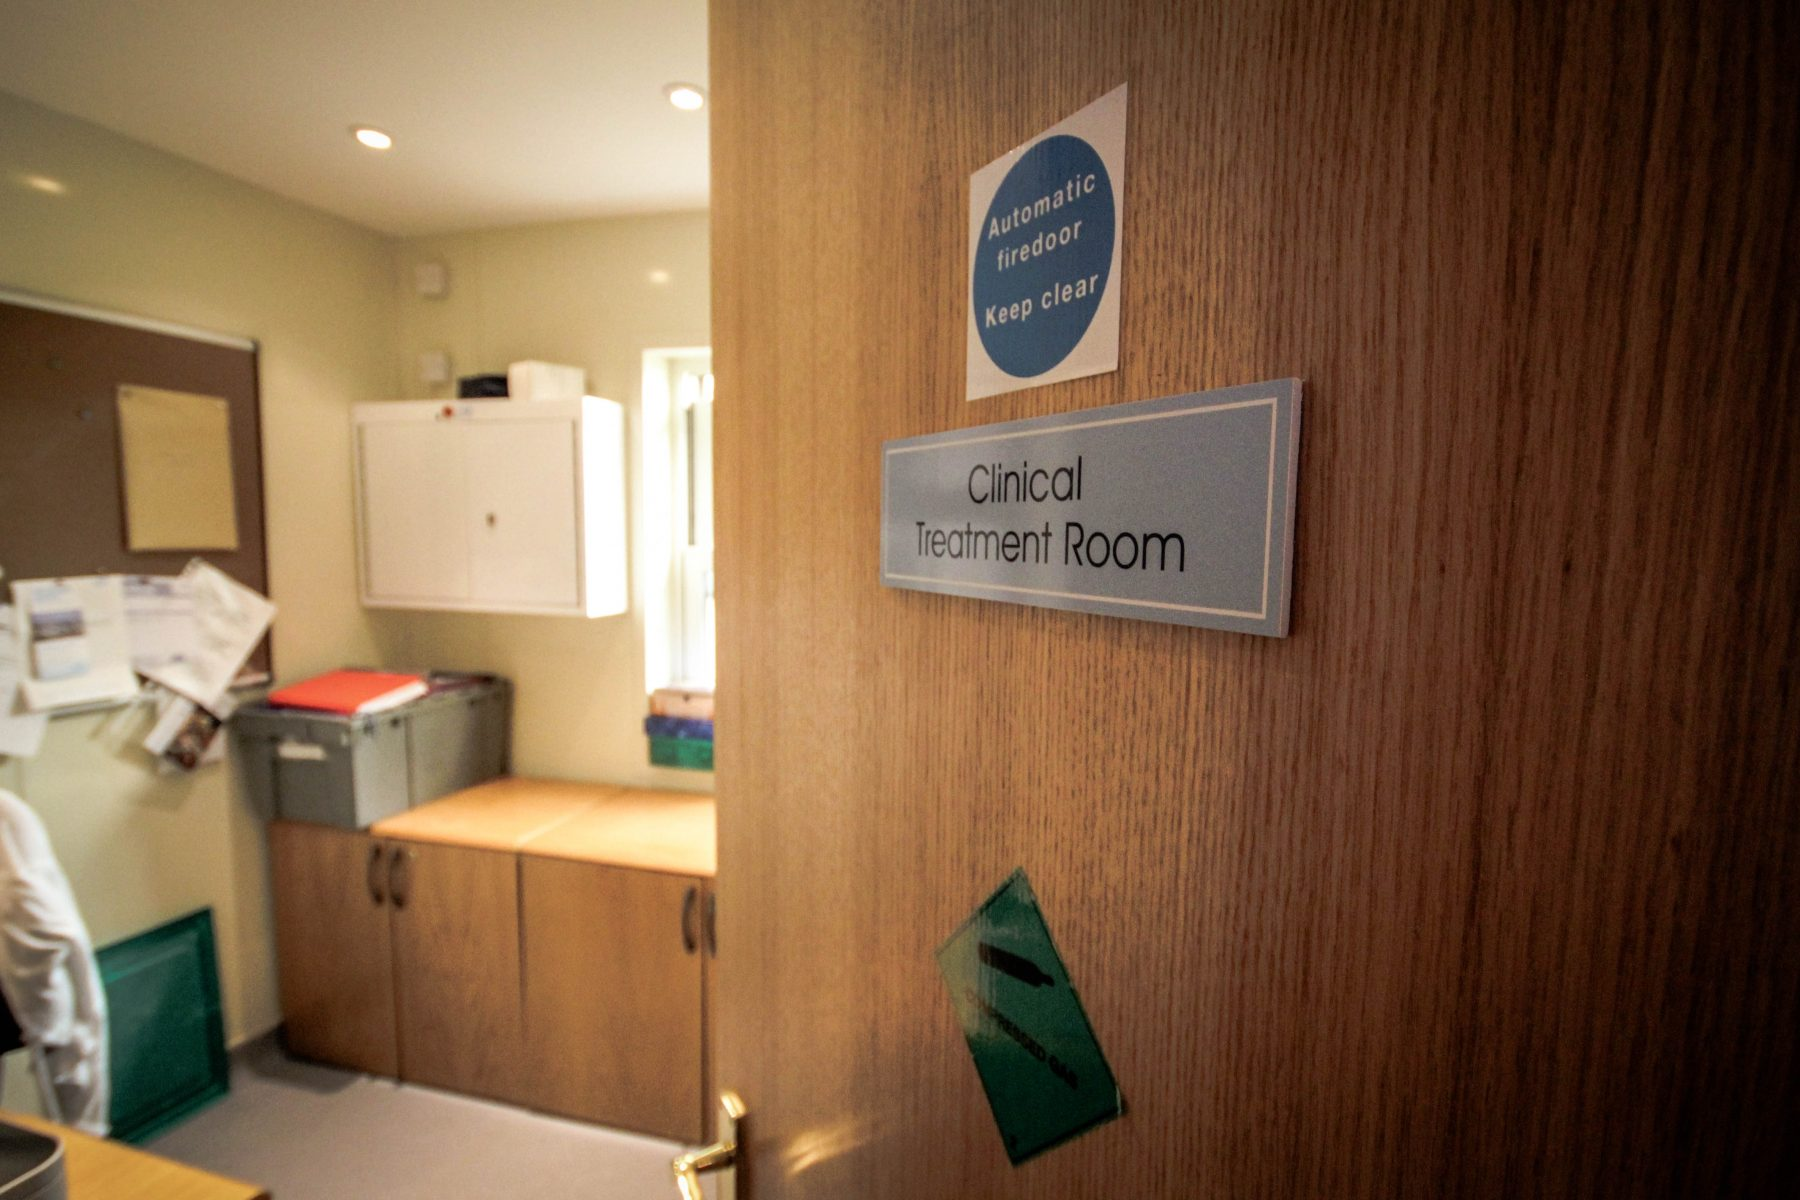 Clinical Treatment Room